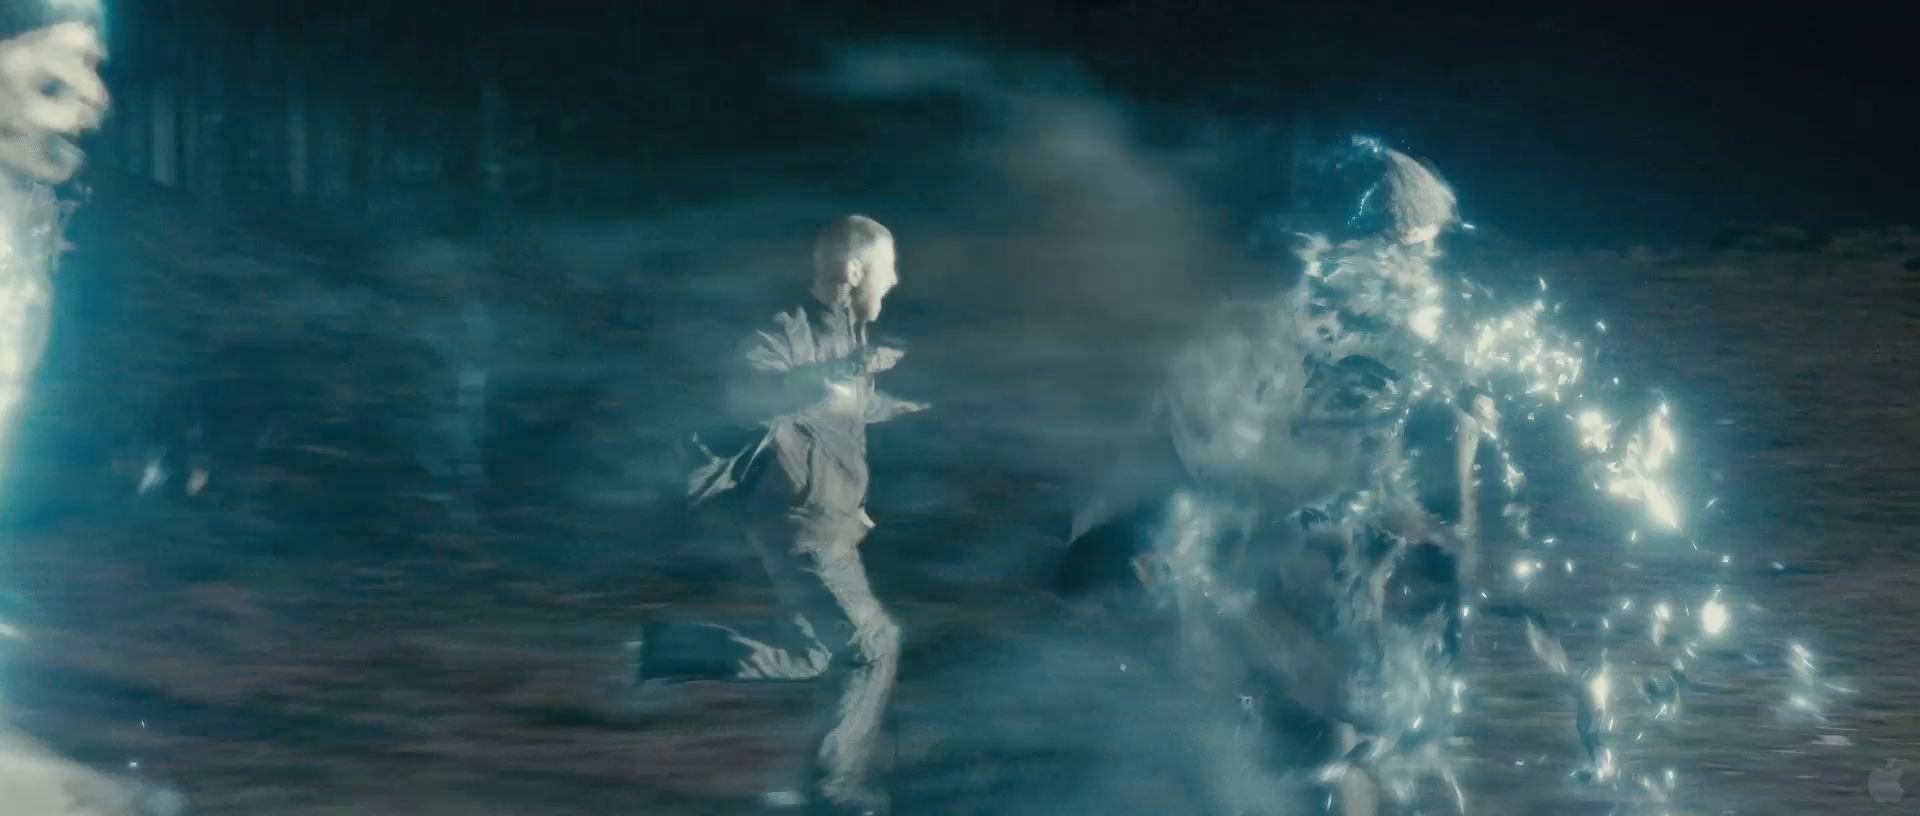 Harry Potter BlogHogwarts HP7 2 Trailer 77